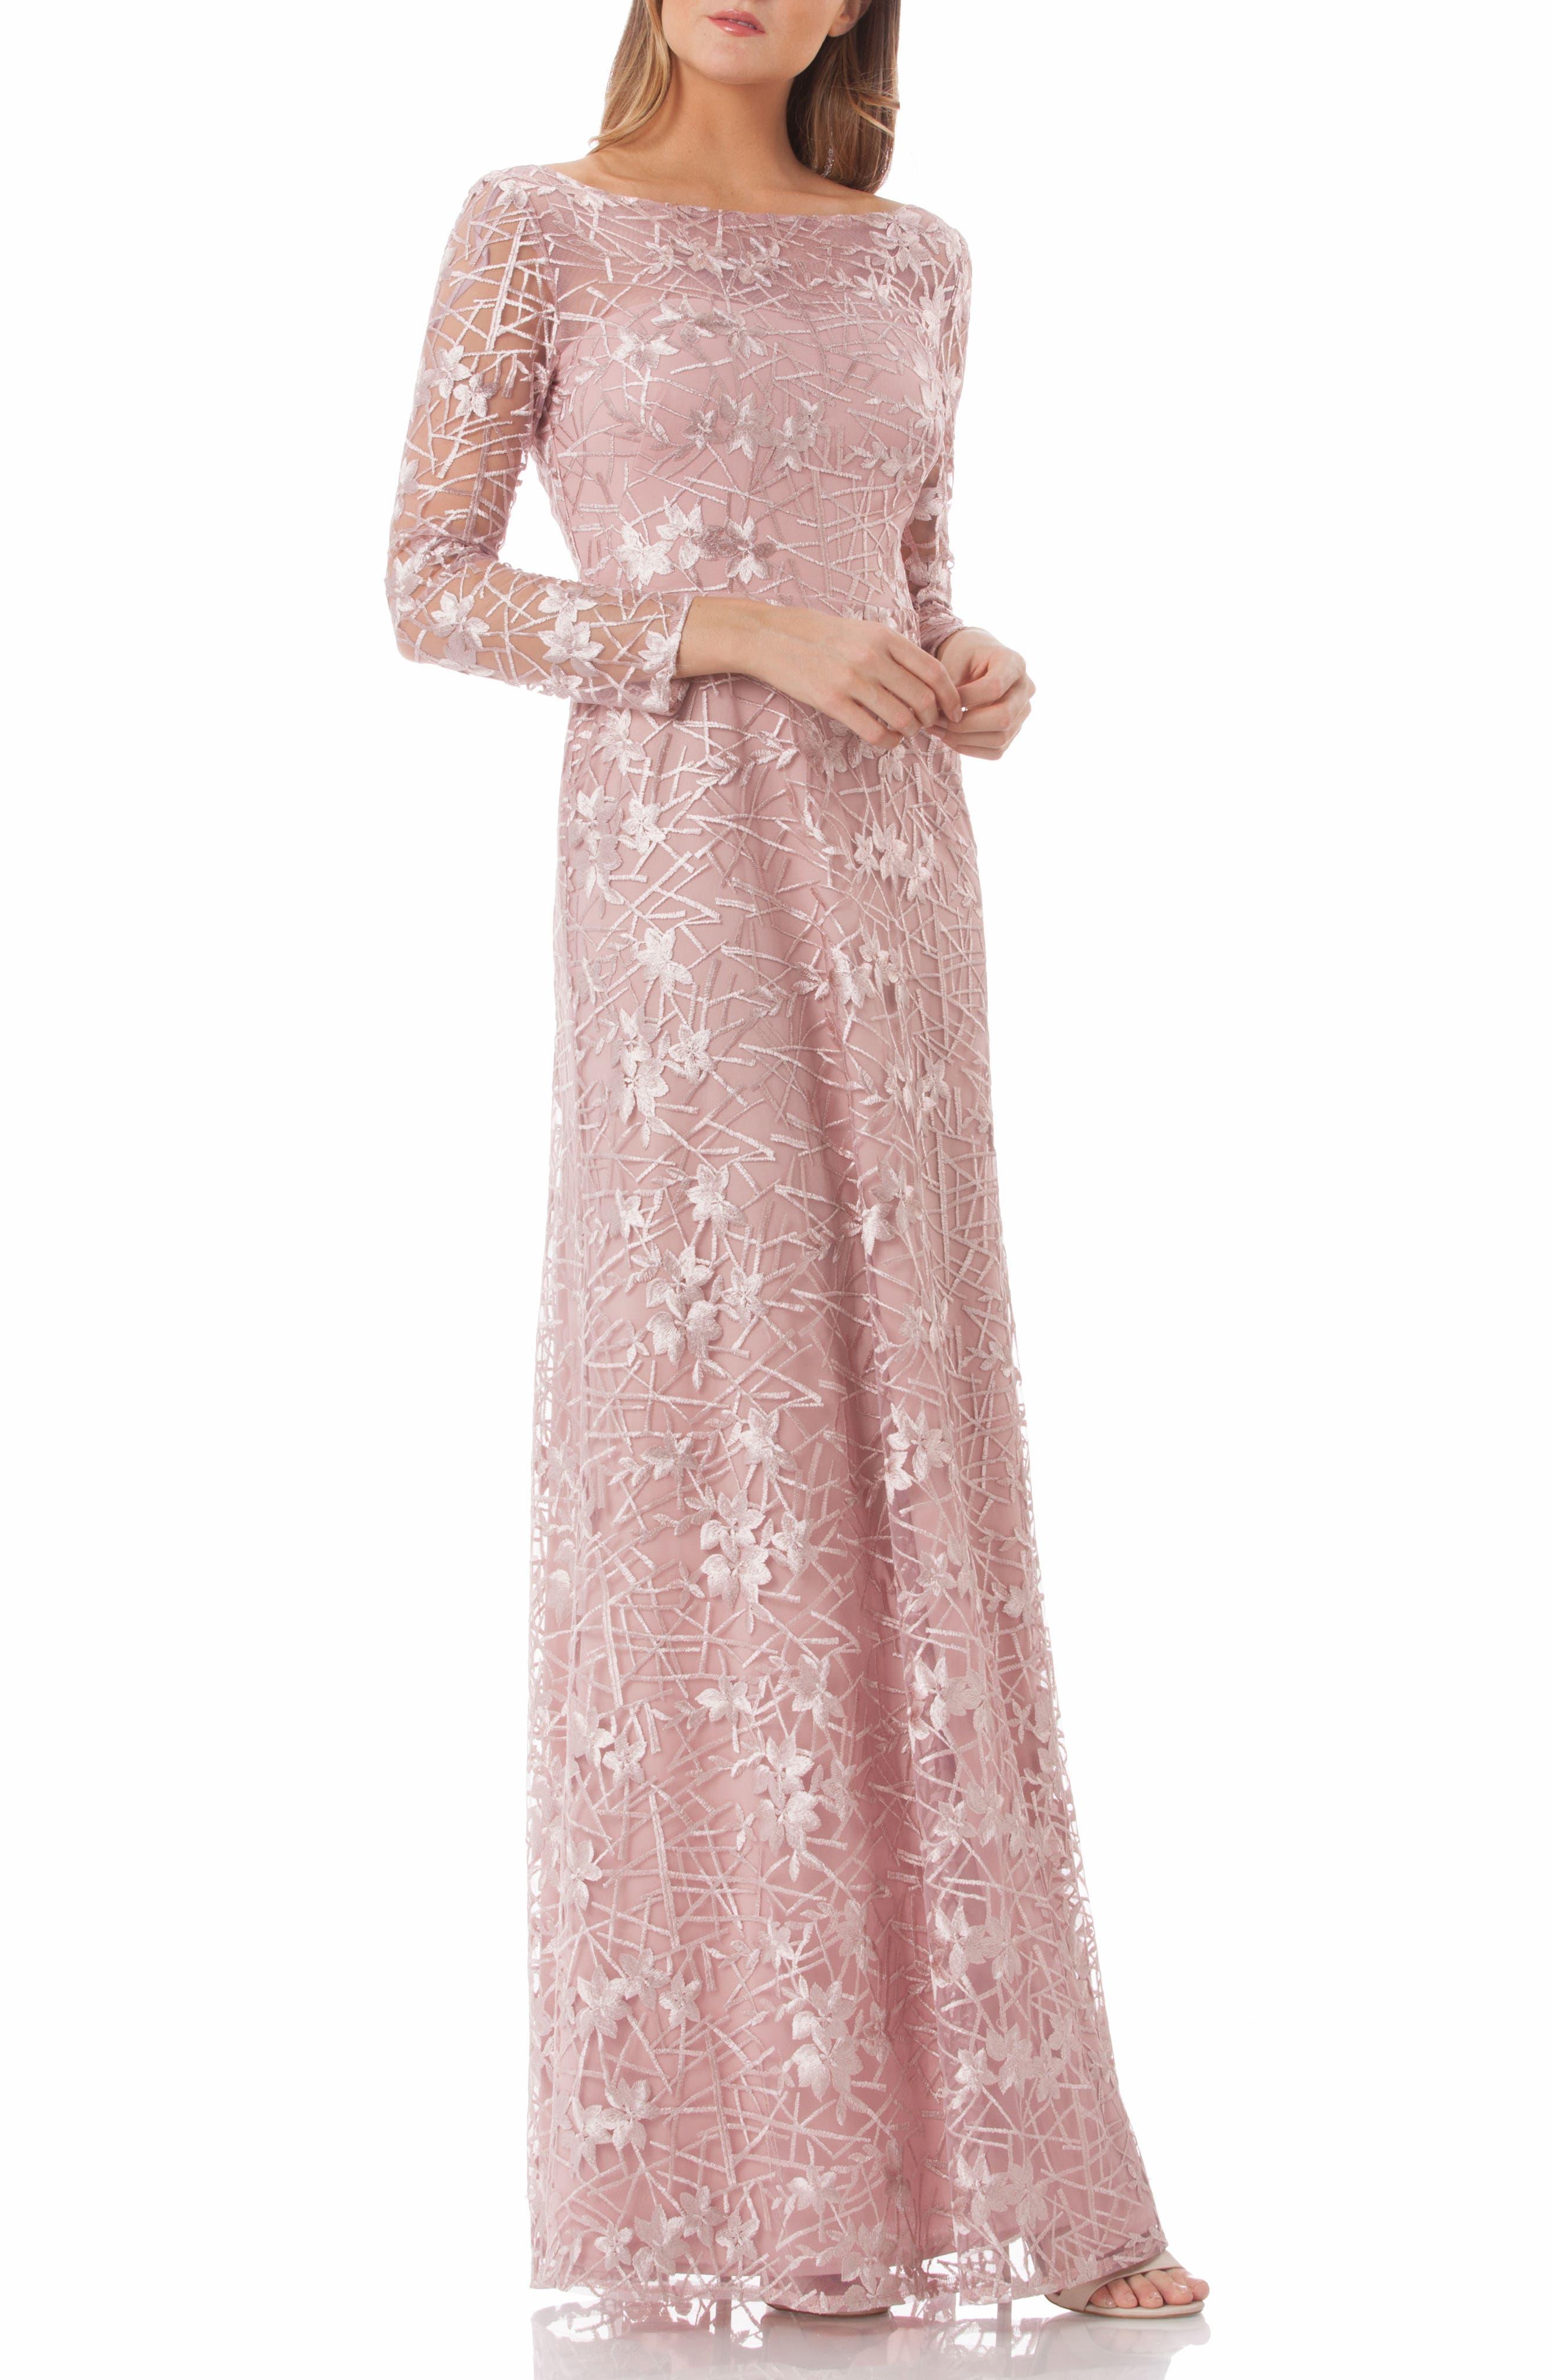 Boat Neck 2018 Prom Dresses | Nordstrom